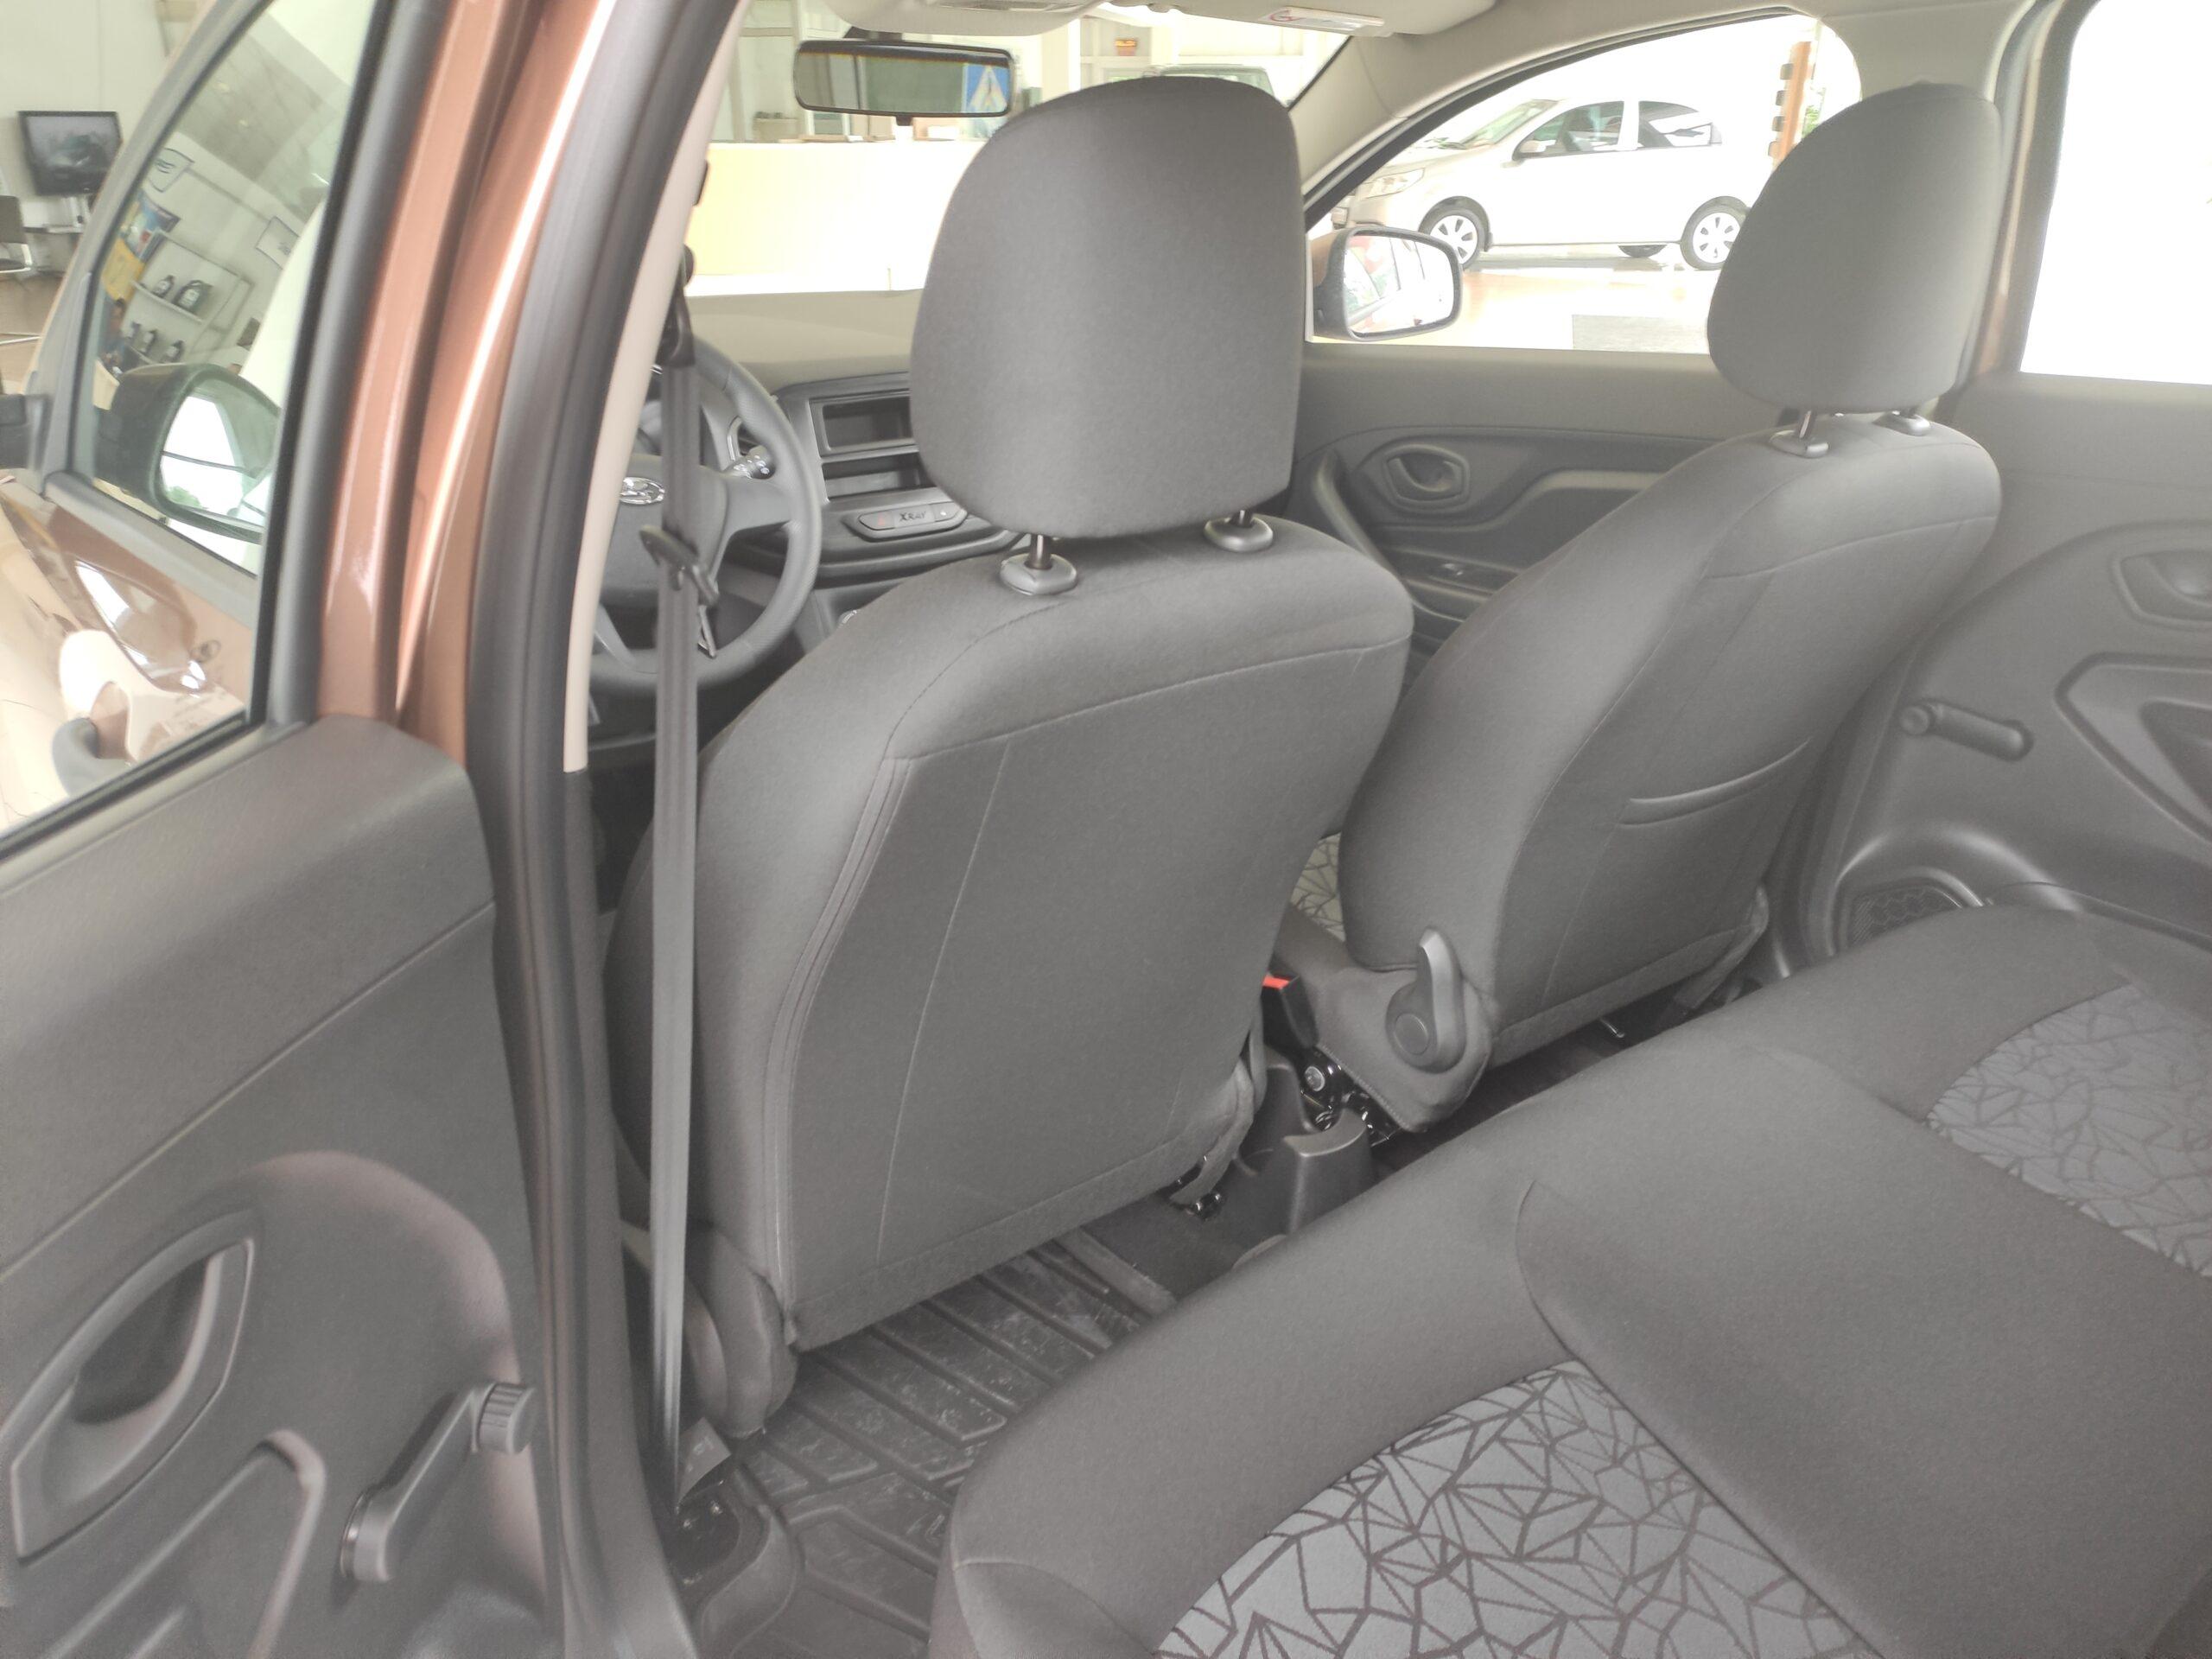 LADA XRAY 1.6 л 16-кл. (106 л.с.), 5МТ / Classic / Air conditioner, Светло-коричневый «Пума» 2021